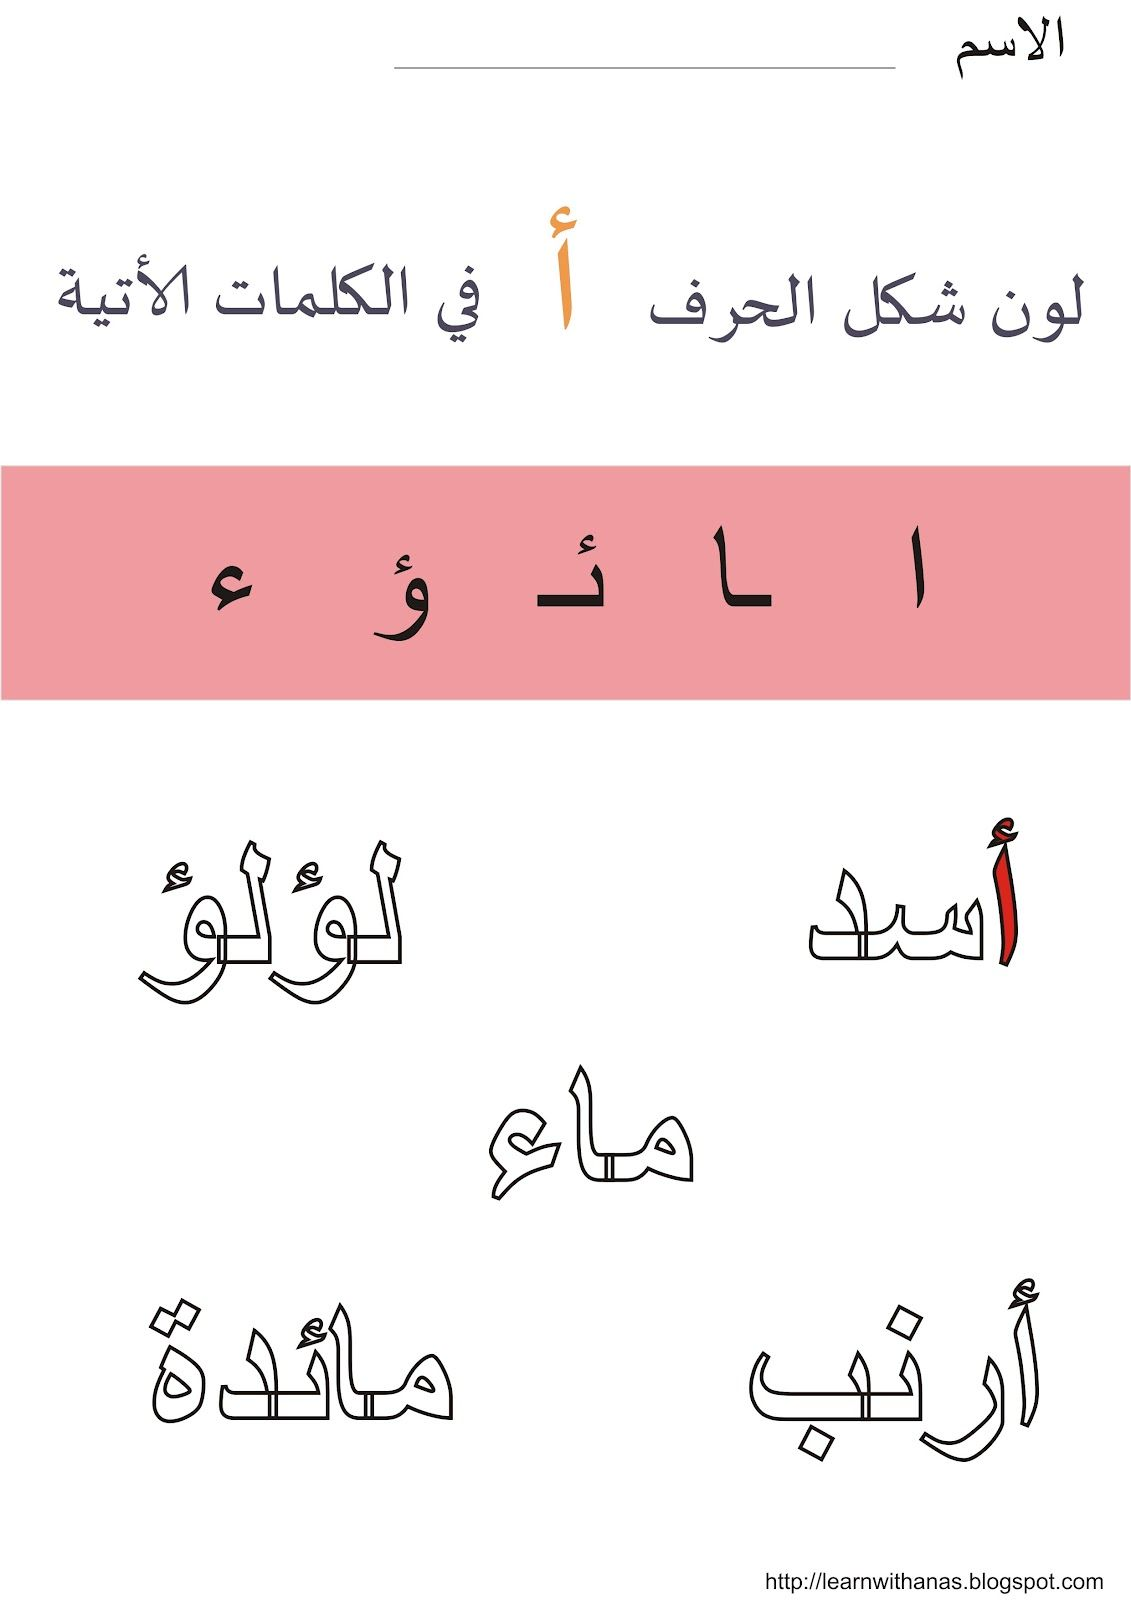 Shakel El 7aref Aleef Jpg 1131 1600 Learn Arabic Alphabet Alphabet For Kids Learning Arabic